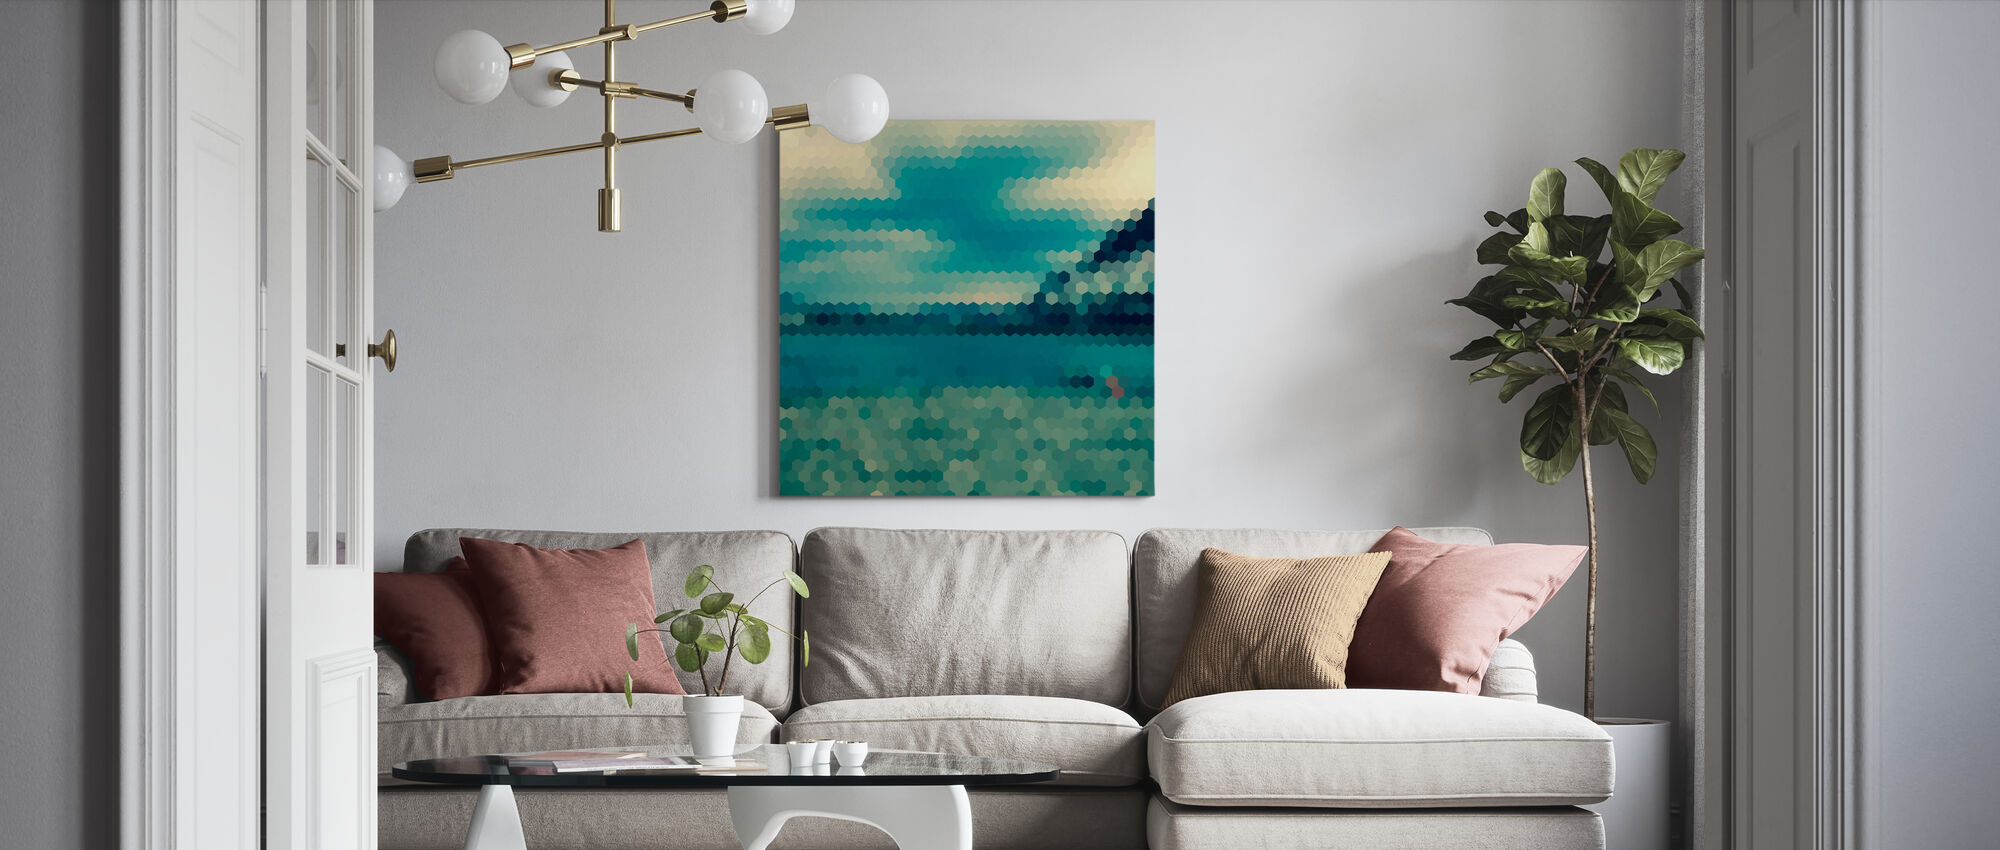 Hexagon Landscape Pattern - Canvas print - Living Room